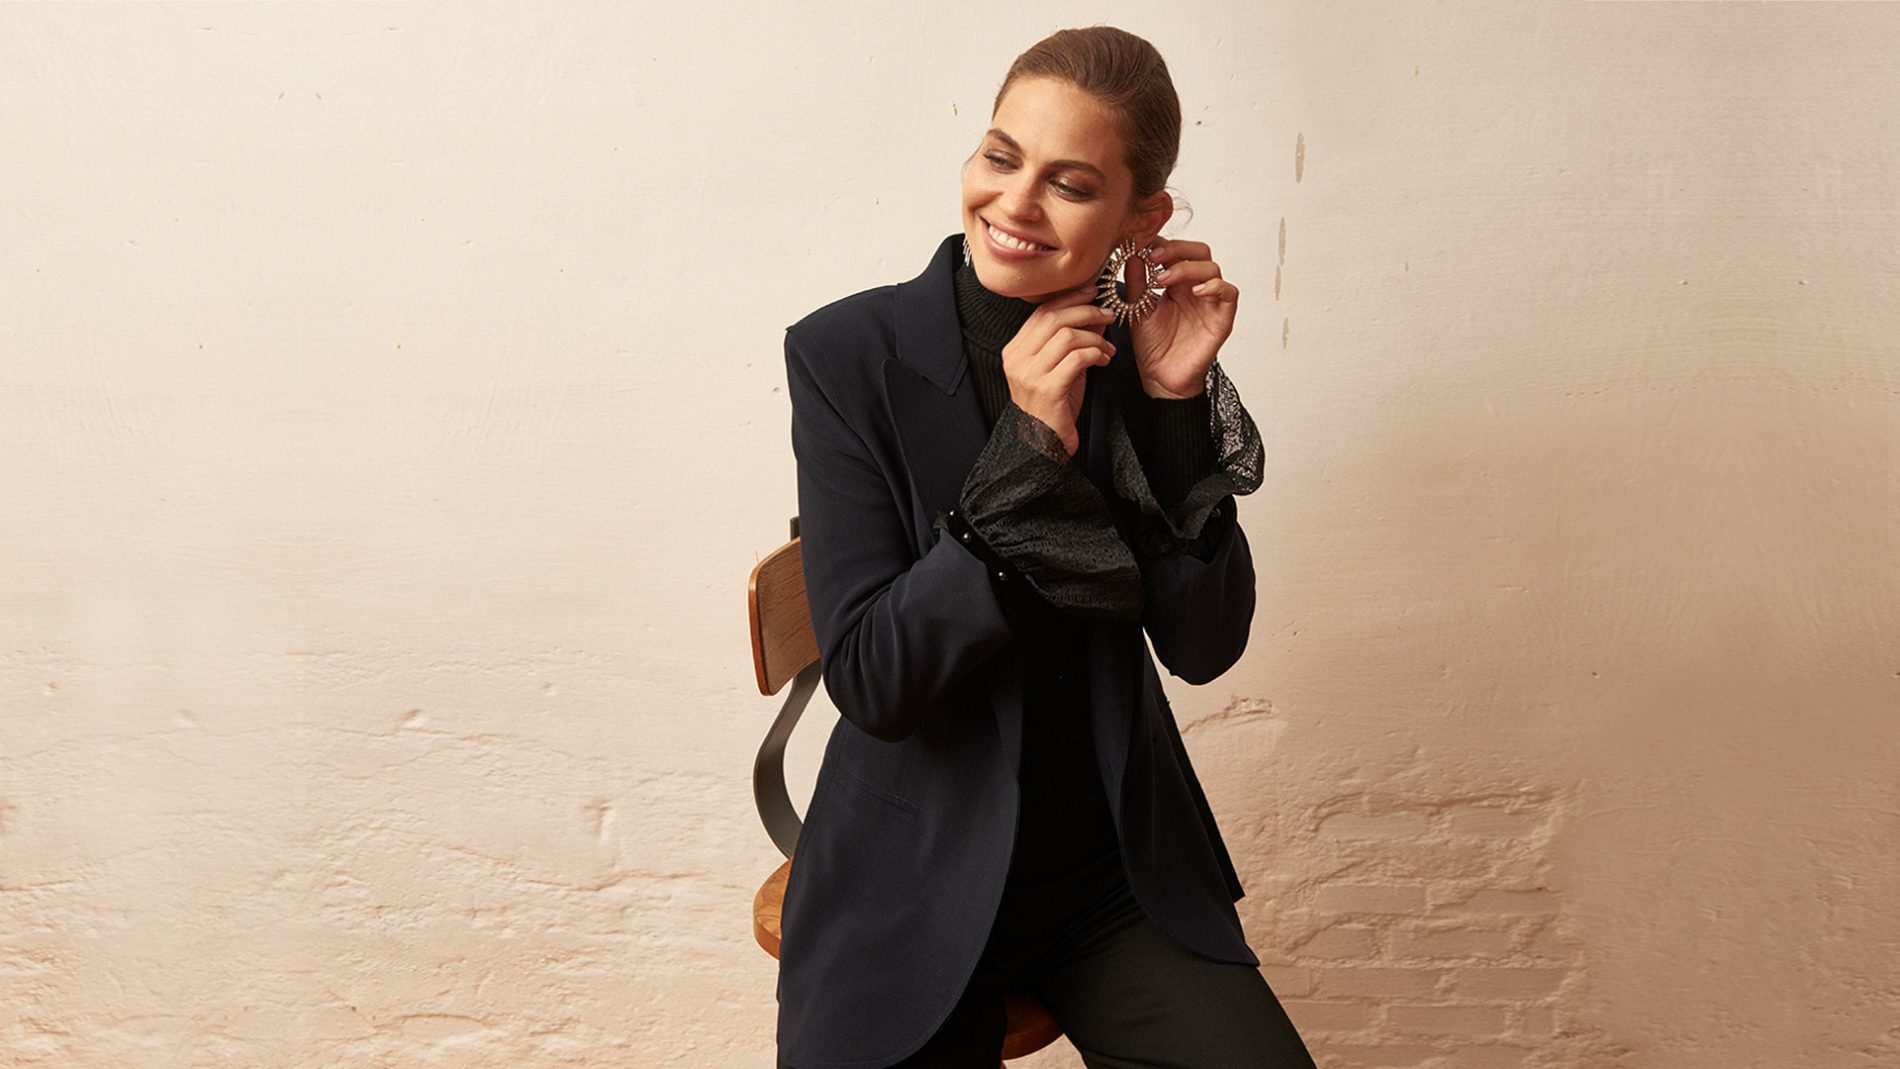 El Corte Inglés Designer Ready-To-Wear Jewelry Norma Kamali Pucci Philosophy Oscar de la Renta